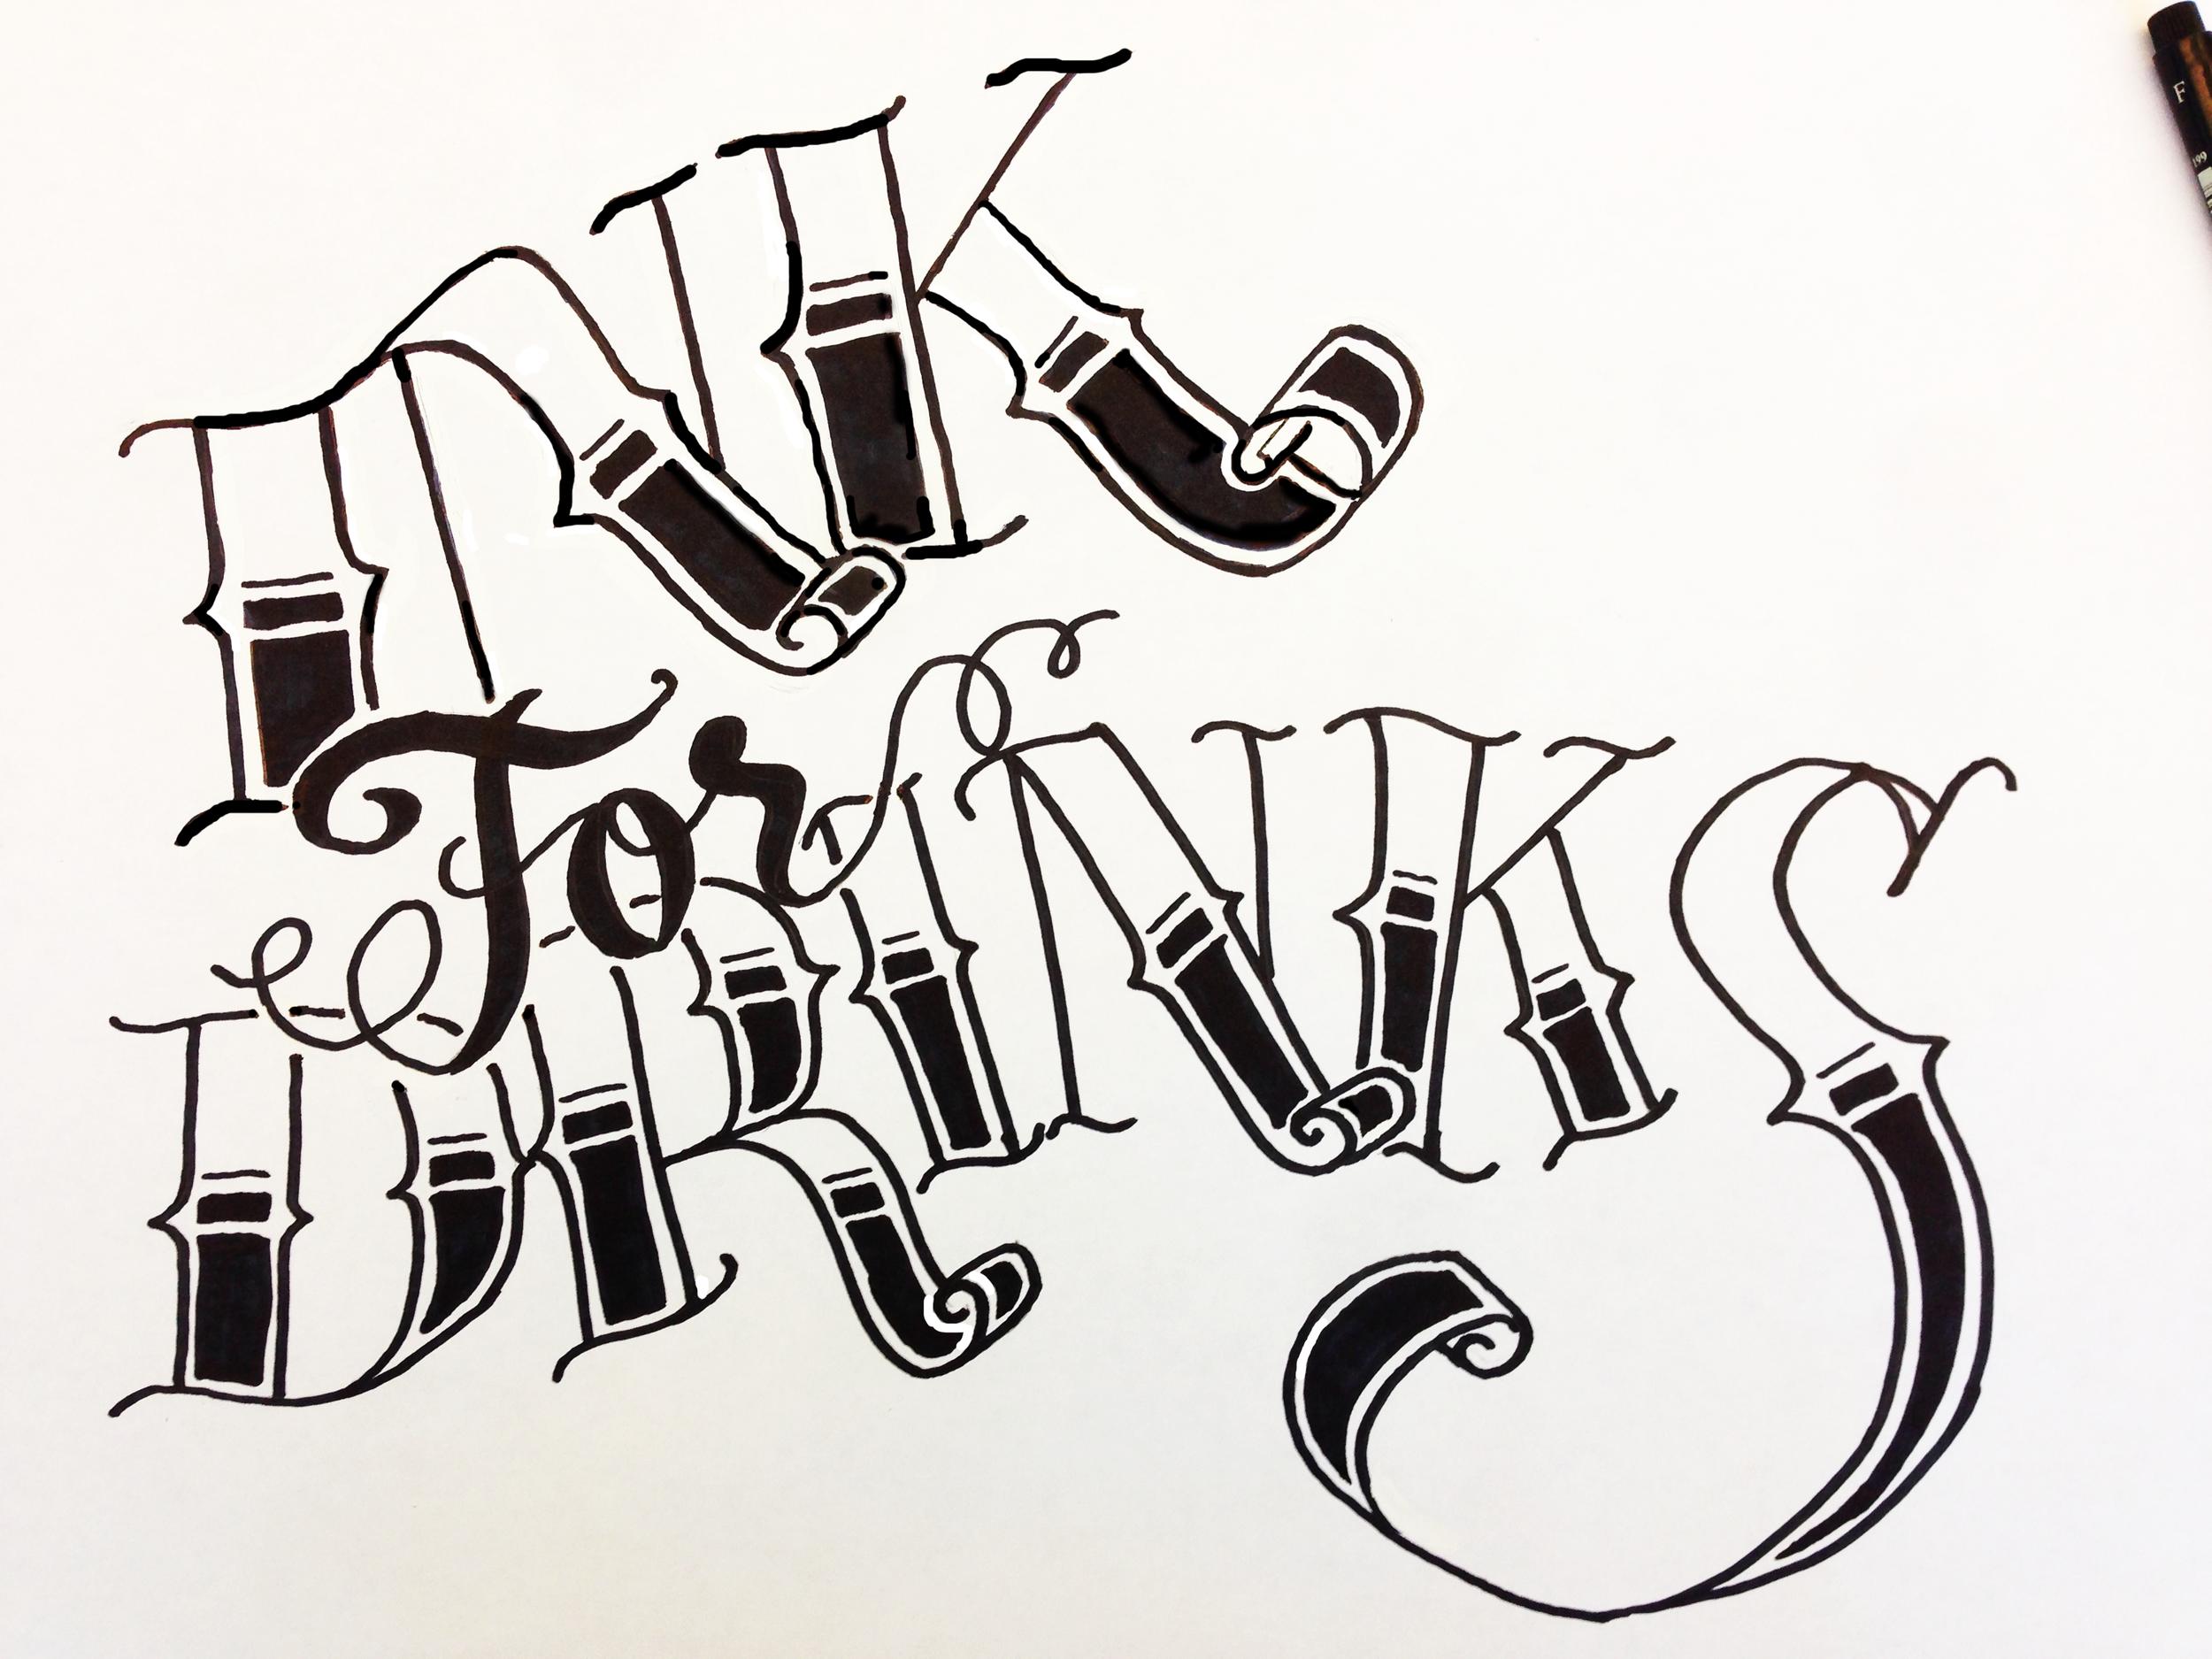 Ink_for_drinks_lettering